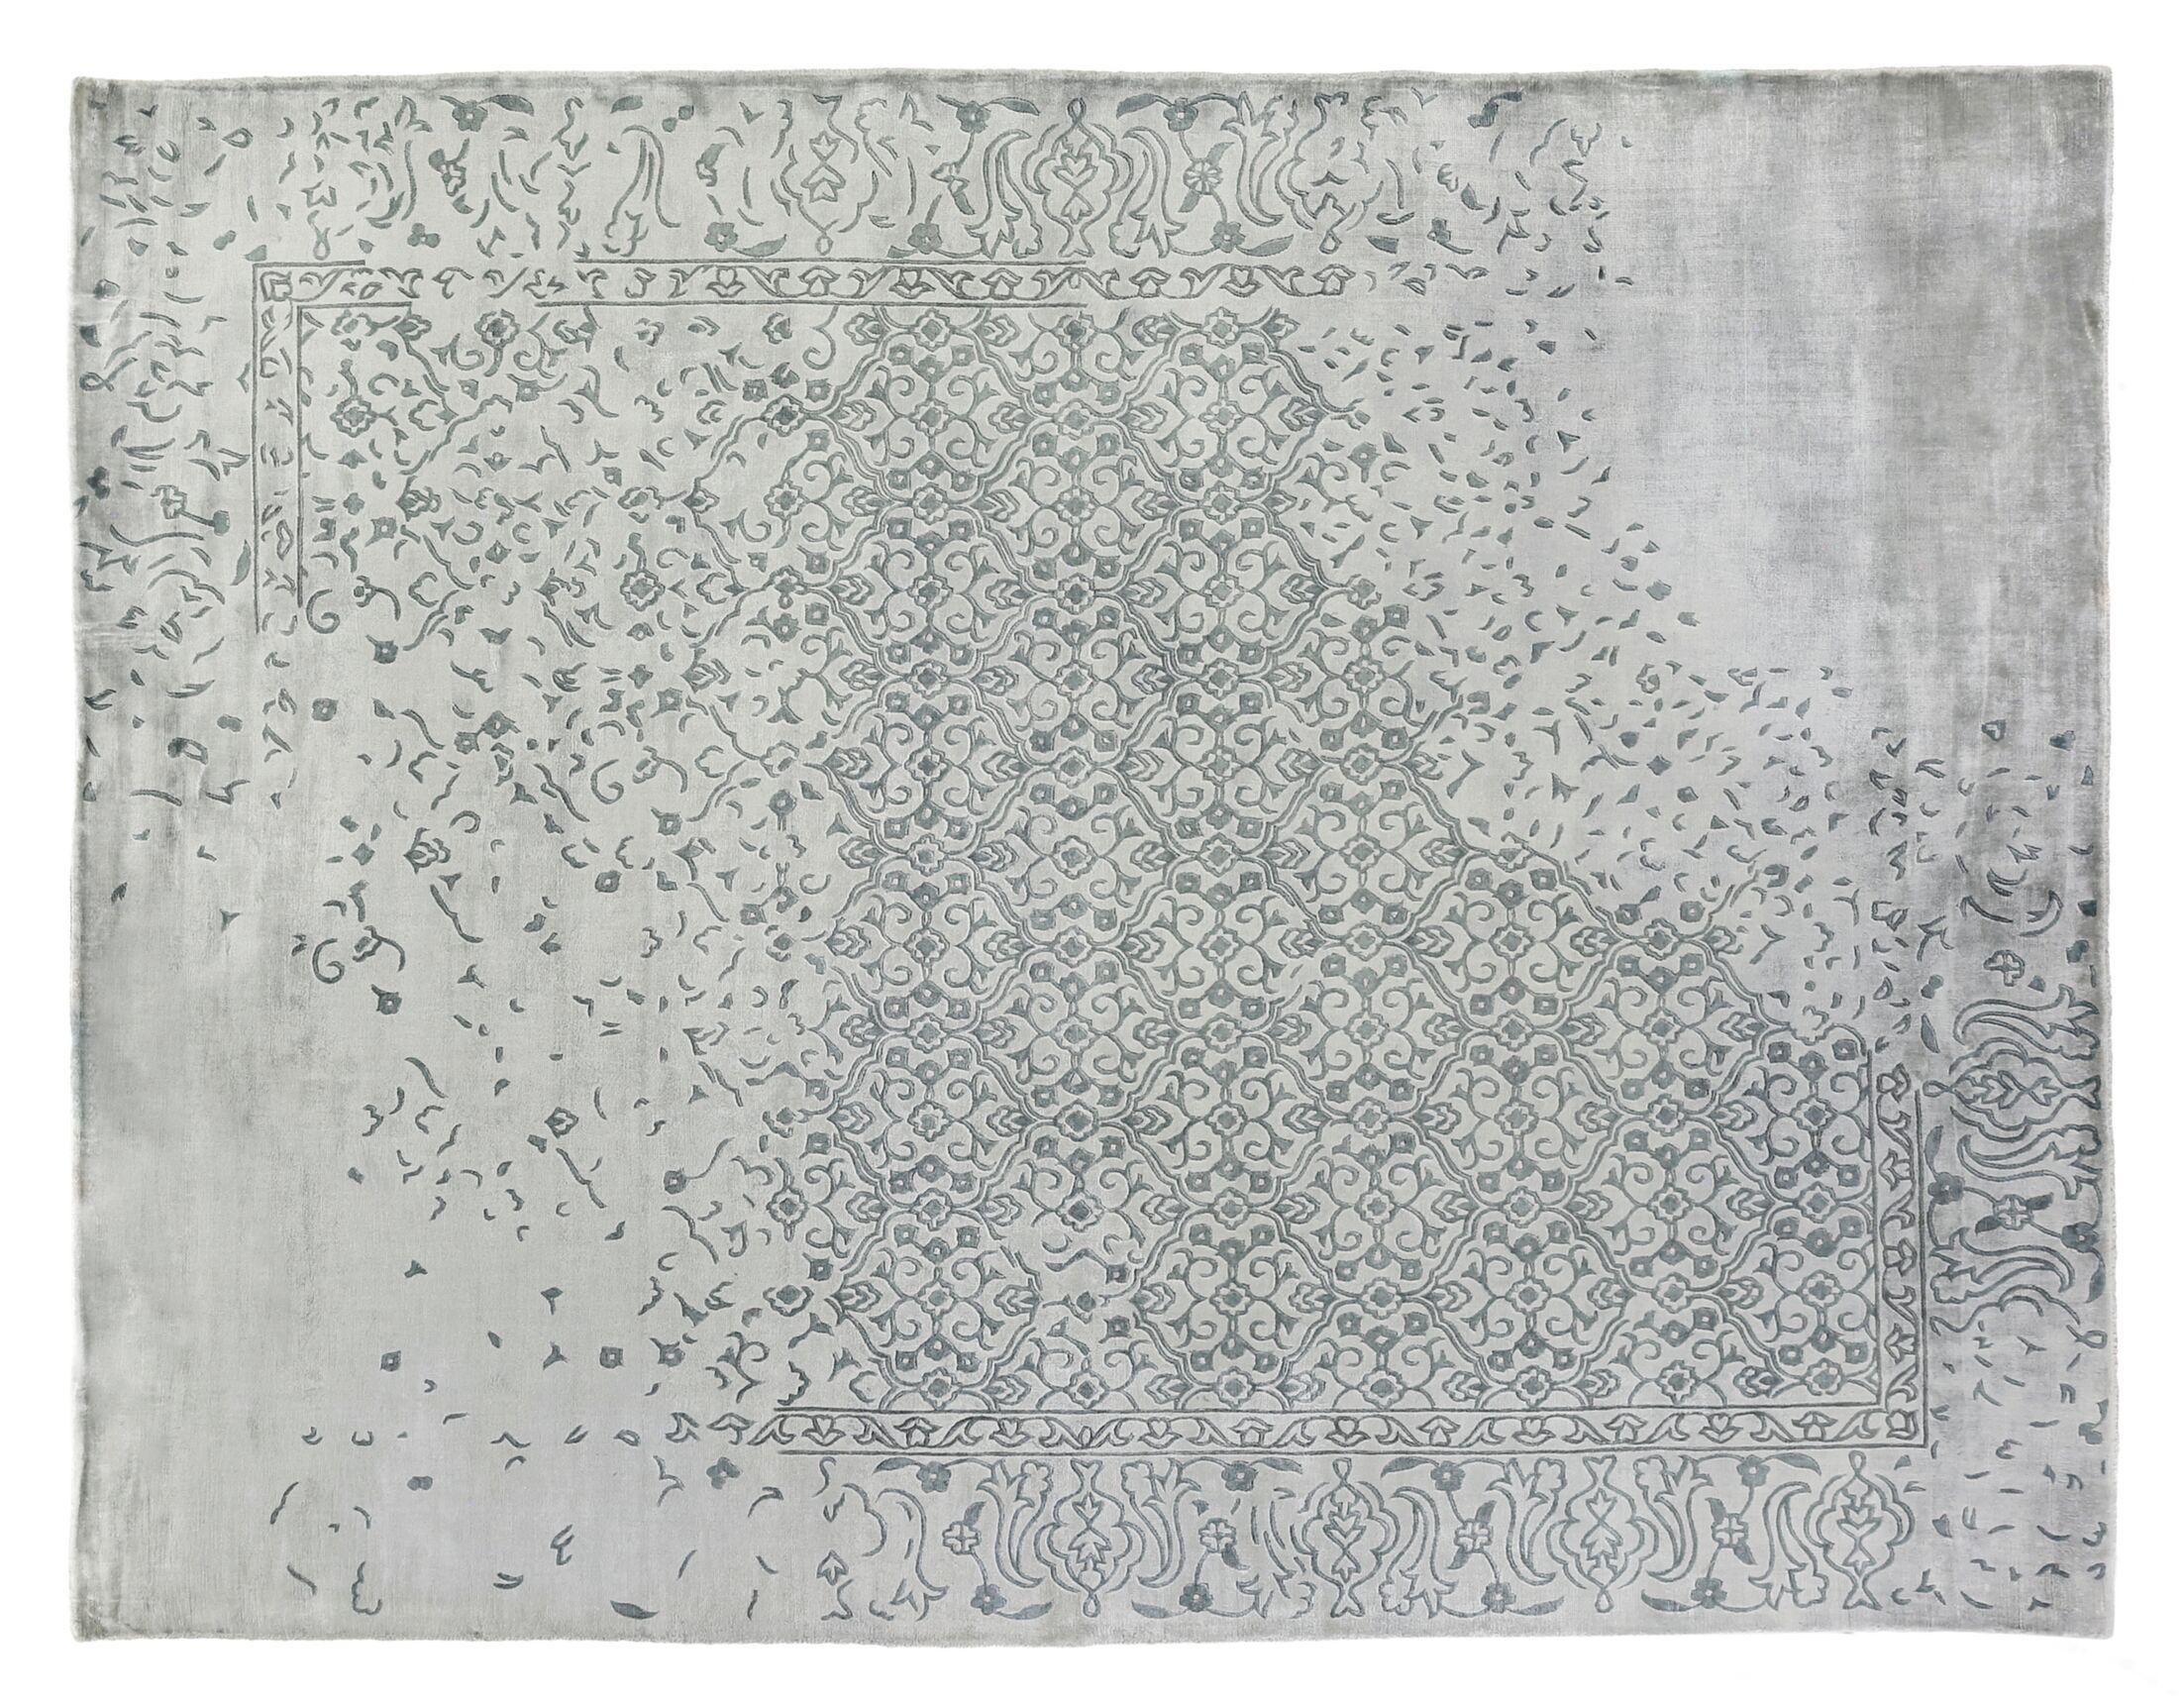 Envy Hand-Woven Gray Area Rug Rug Size: Rectangle 10' x 14'